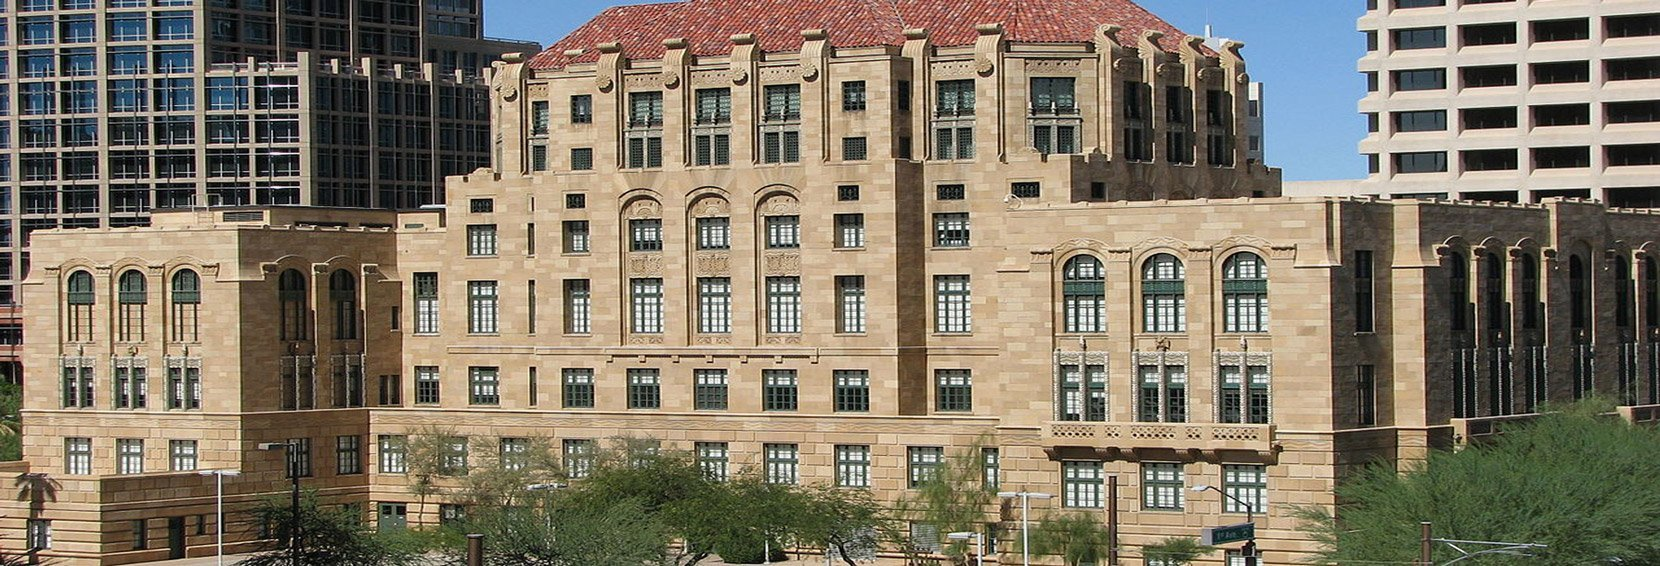 Old Courthouse, Phoenix